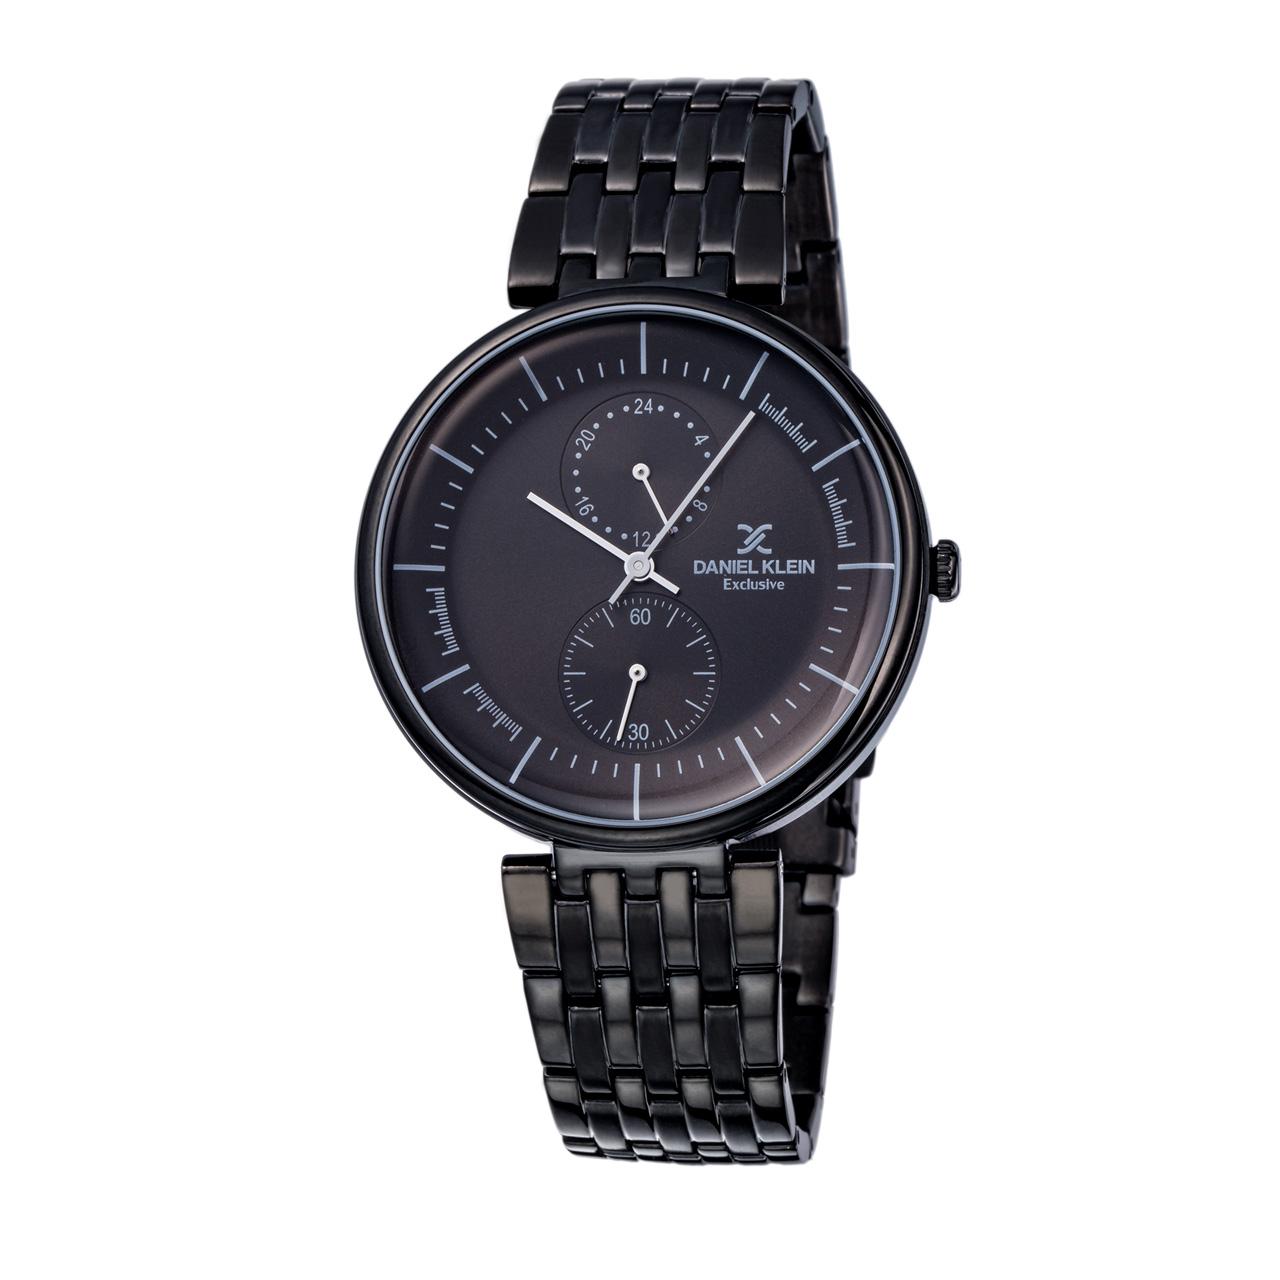 Ceas pentru barbati, Daniel Klein Exclusive, DK11900-4